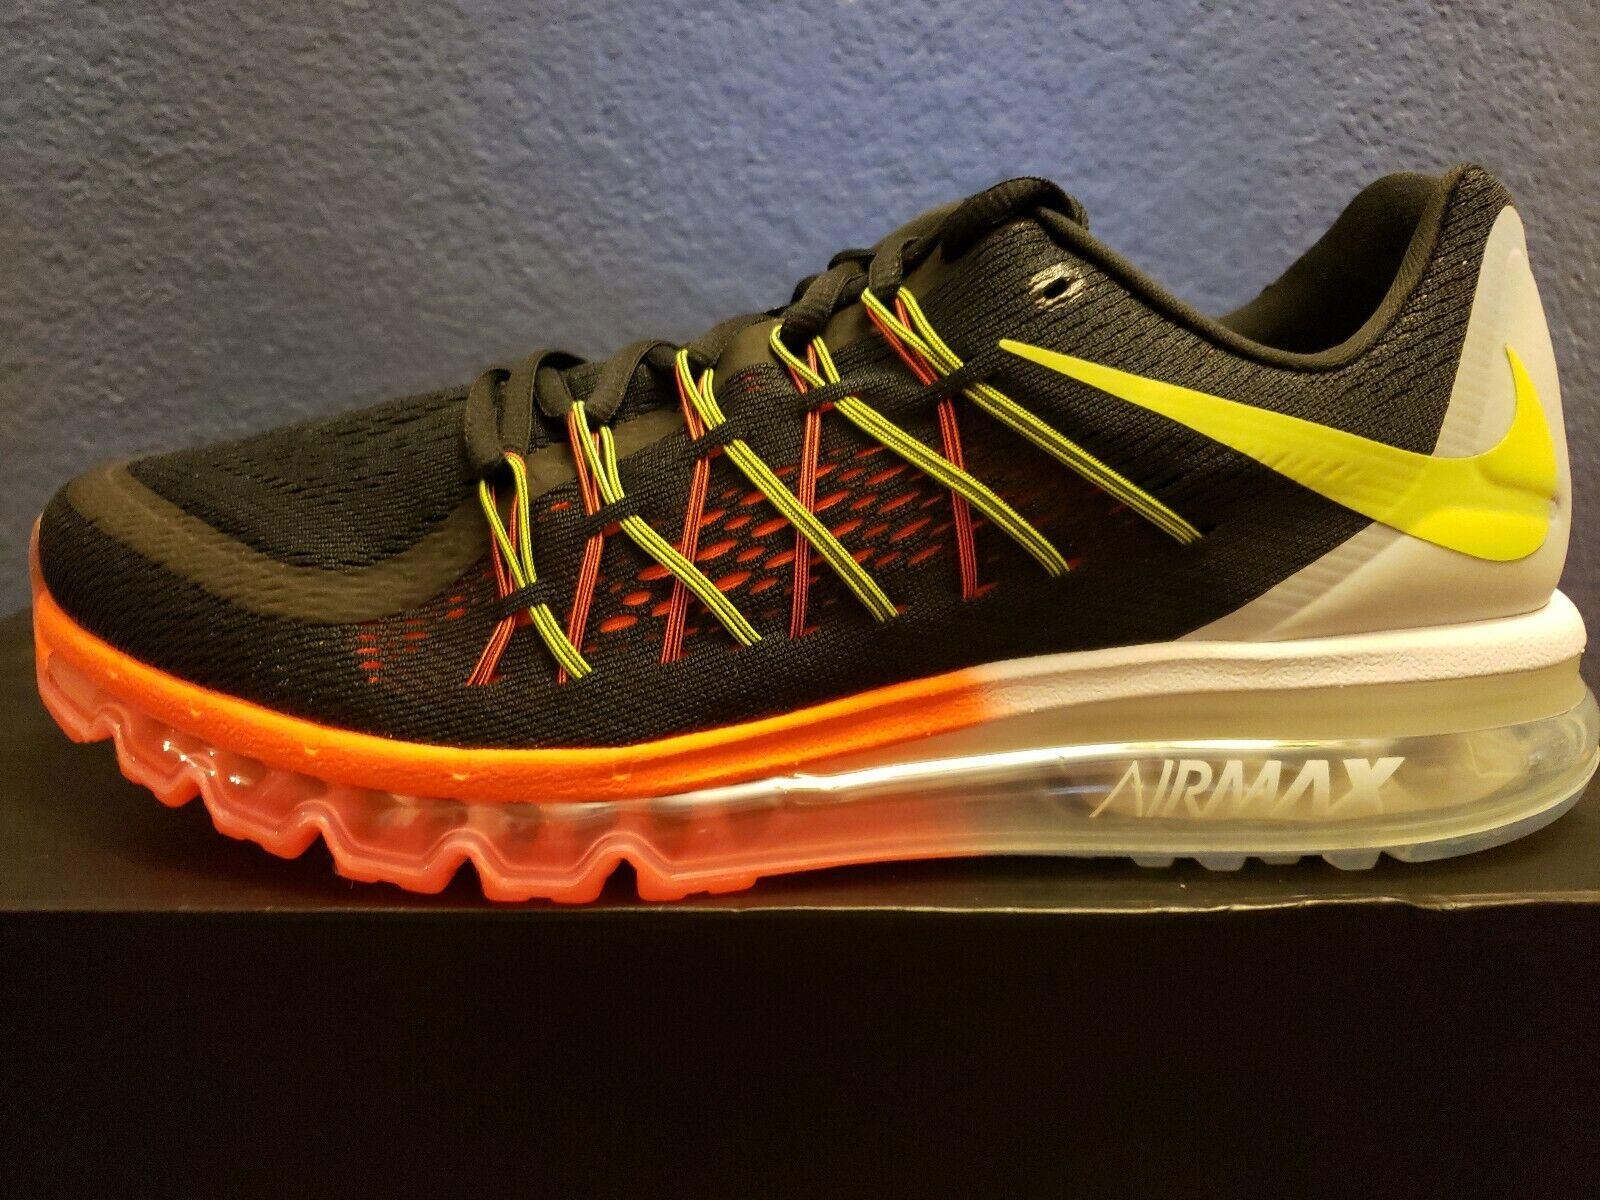 Nike Air Max  Running Sneakers New, Black Volt 698902-007 SKU AA